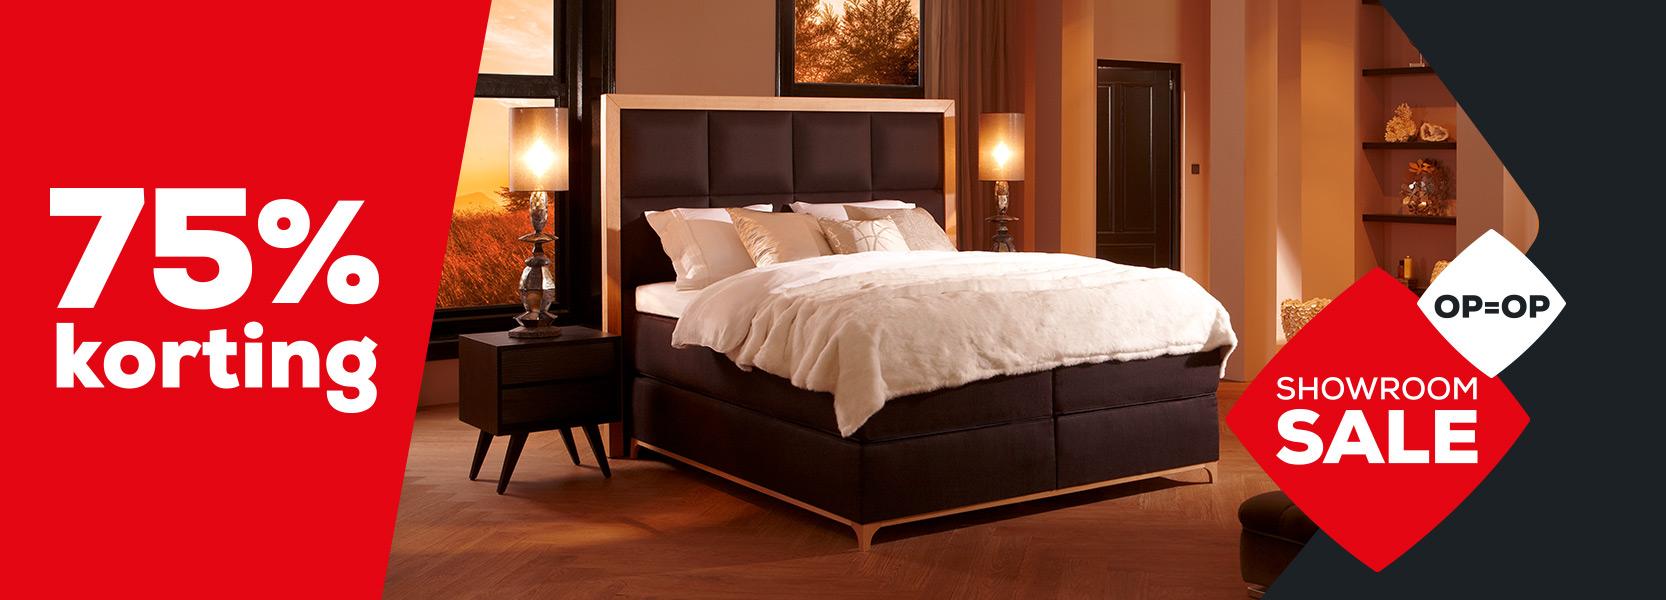 Diks Bedmakers Showroom Sale | Swiss Sense